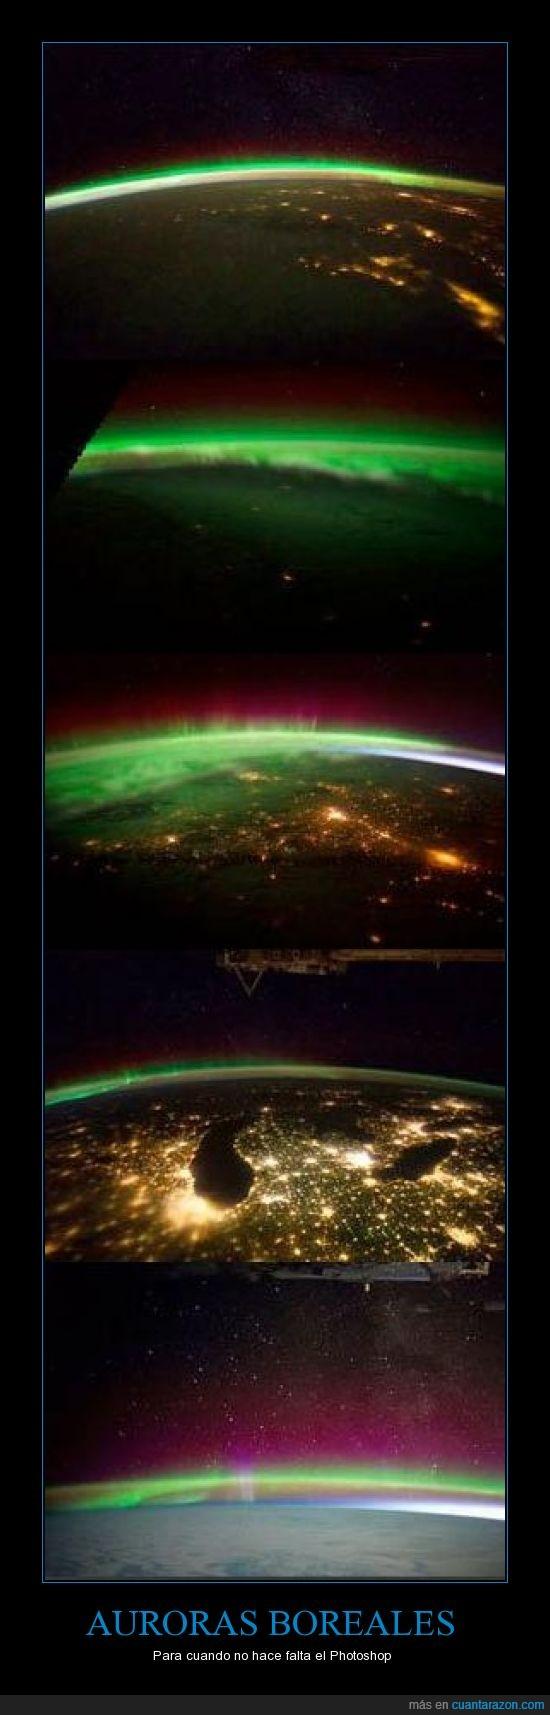 auroras boreal,espacio,fotografias,hermoso,NASA,photoshop